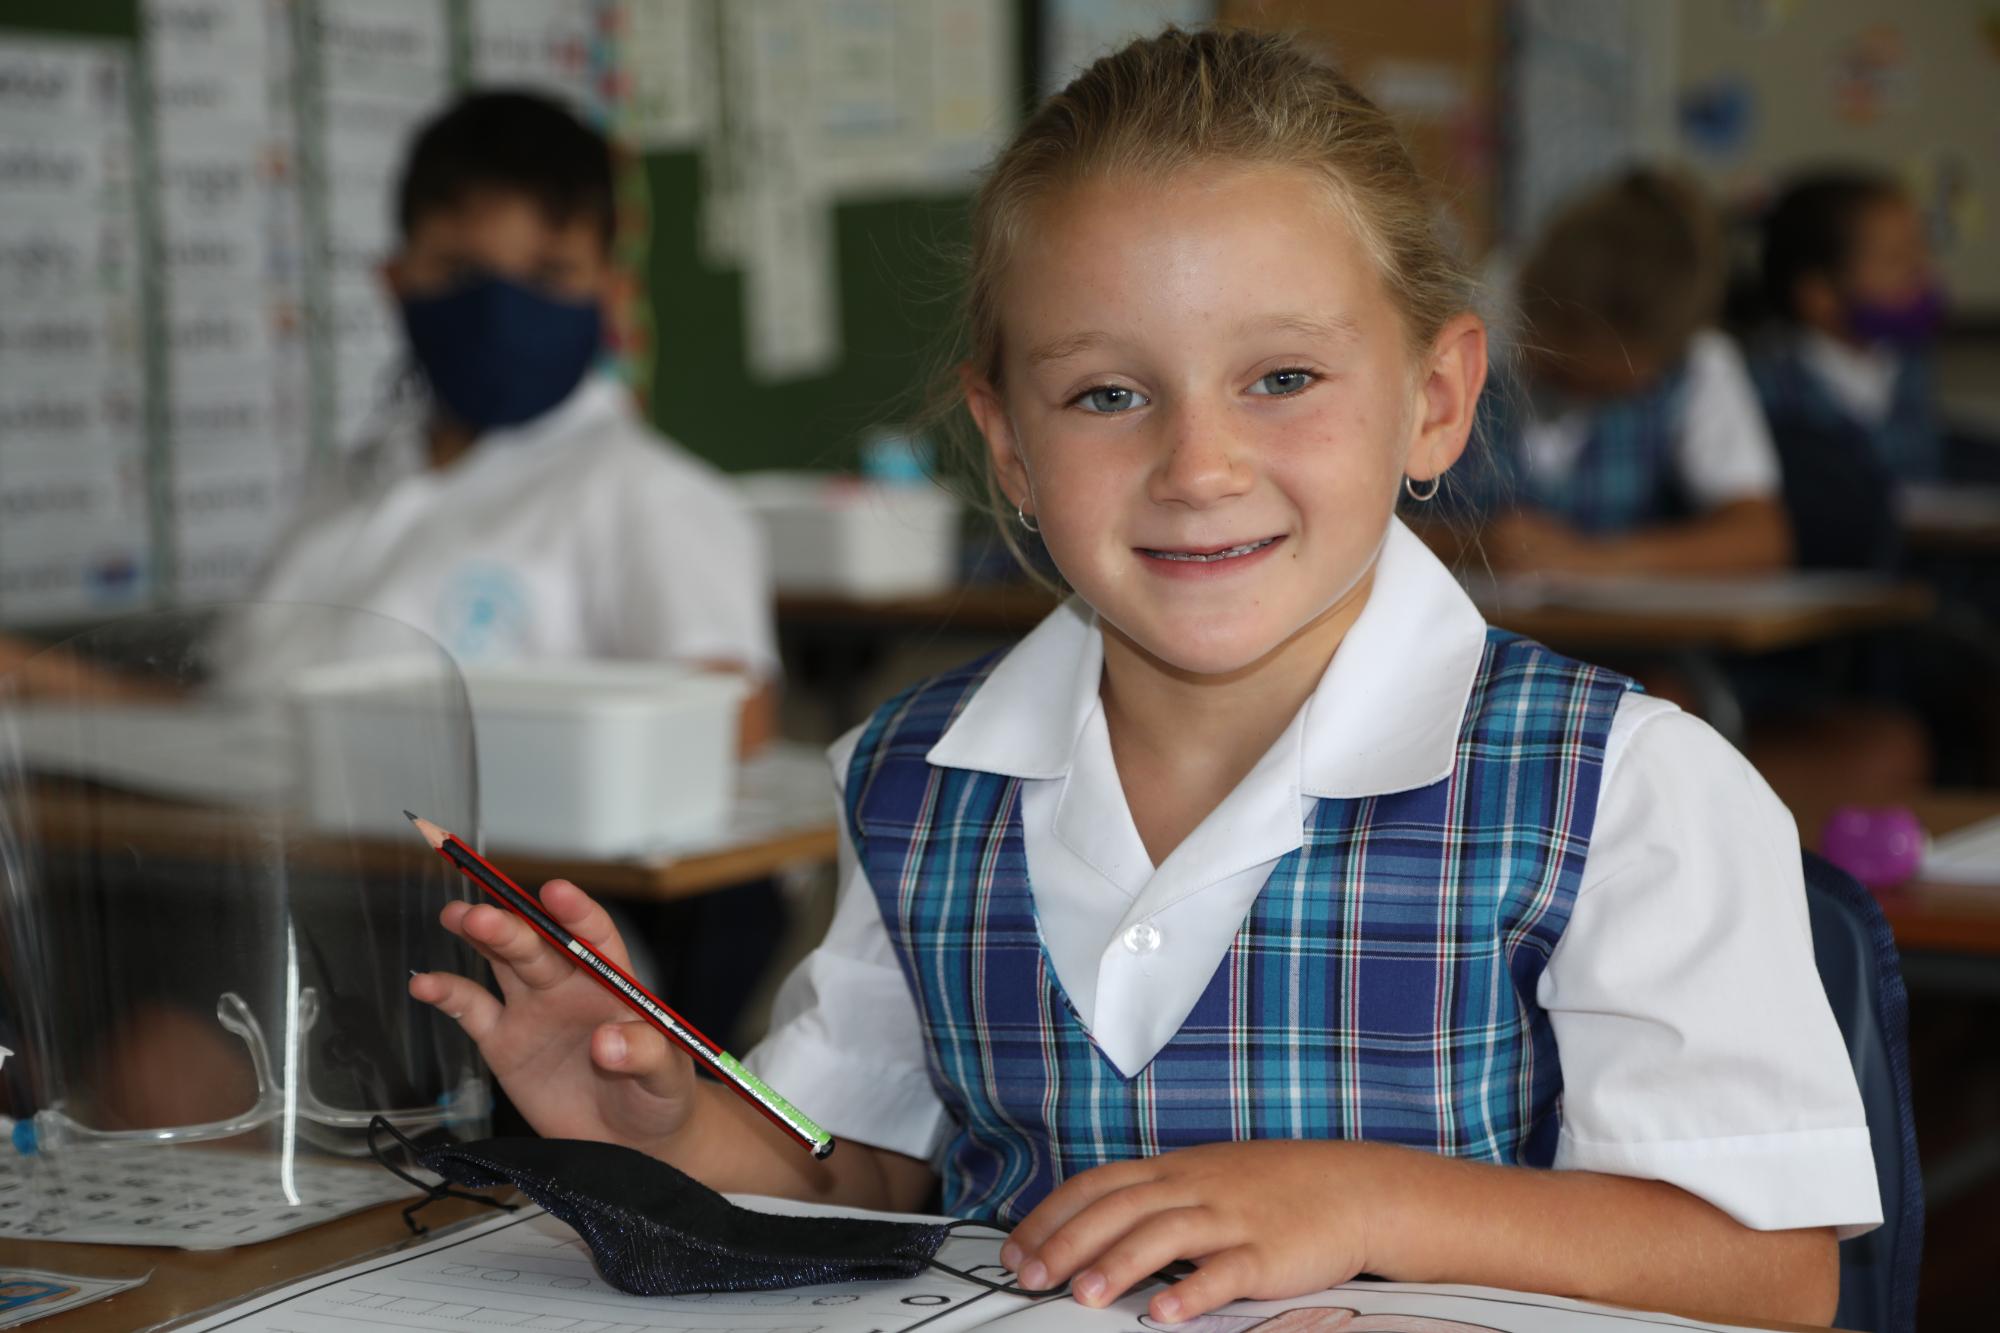 grade_01_first_schoolday_020